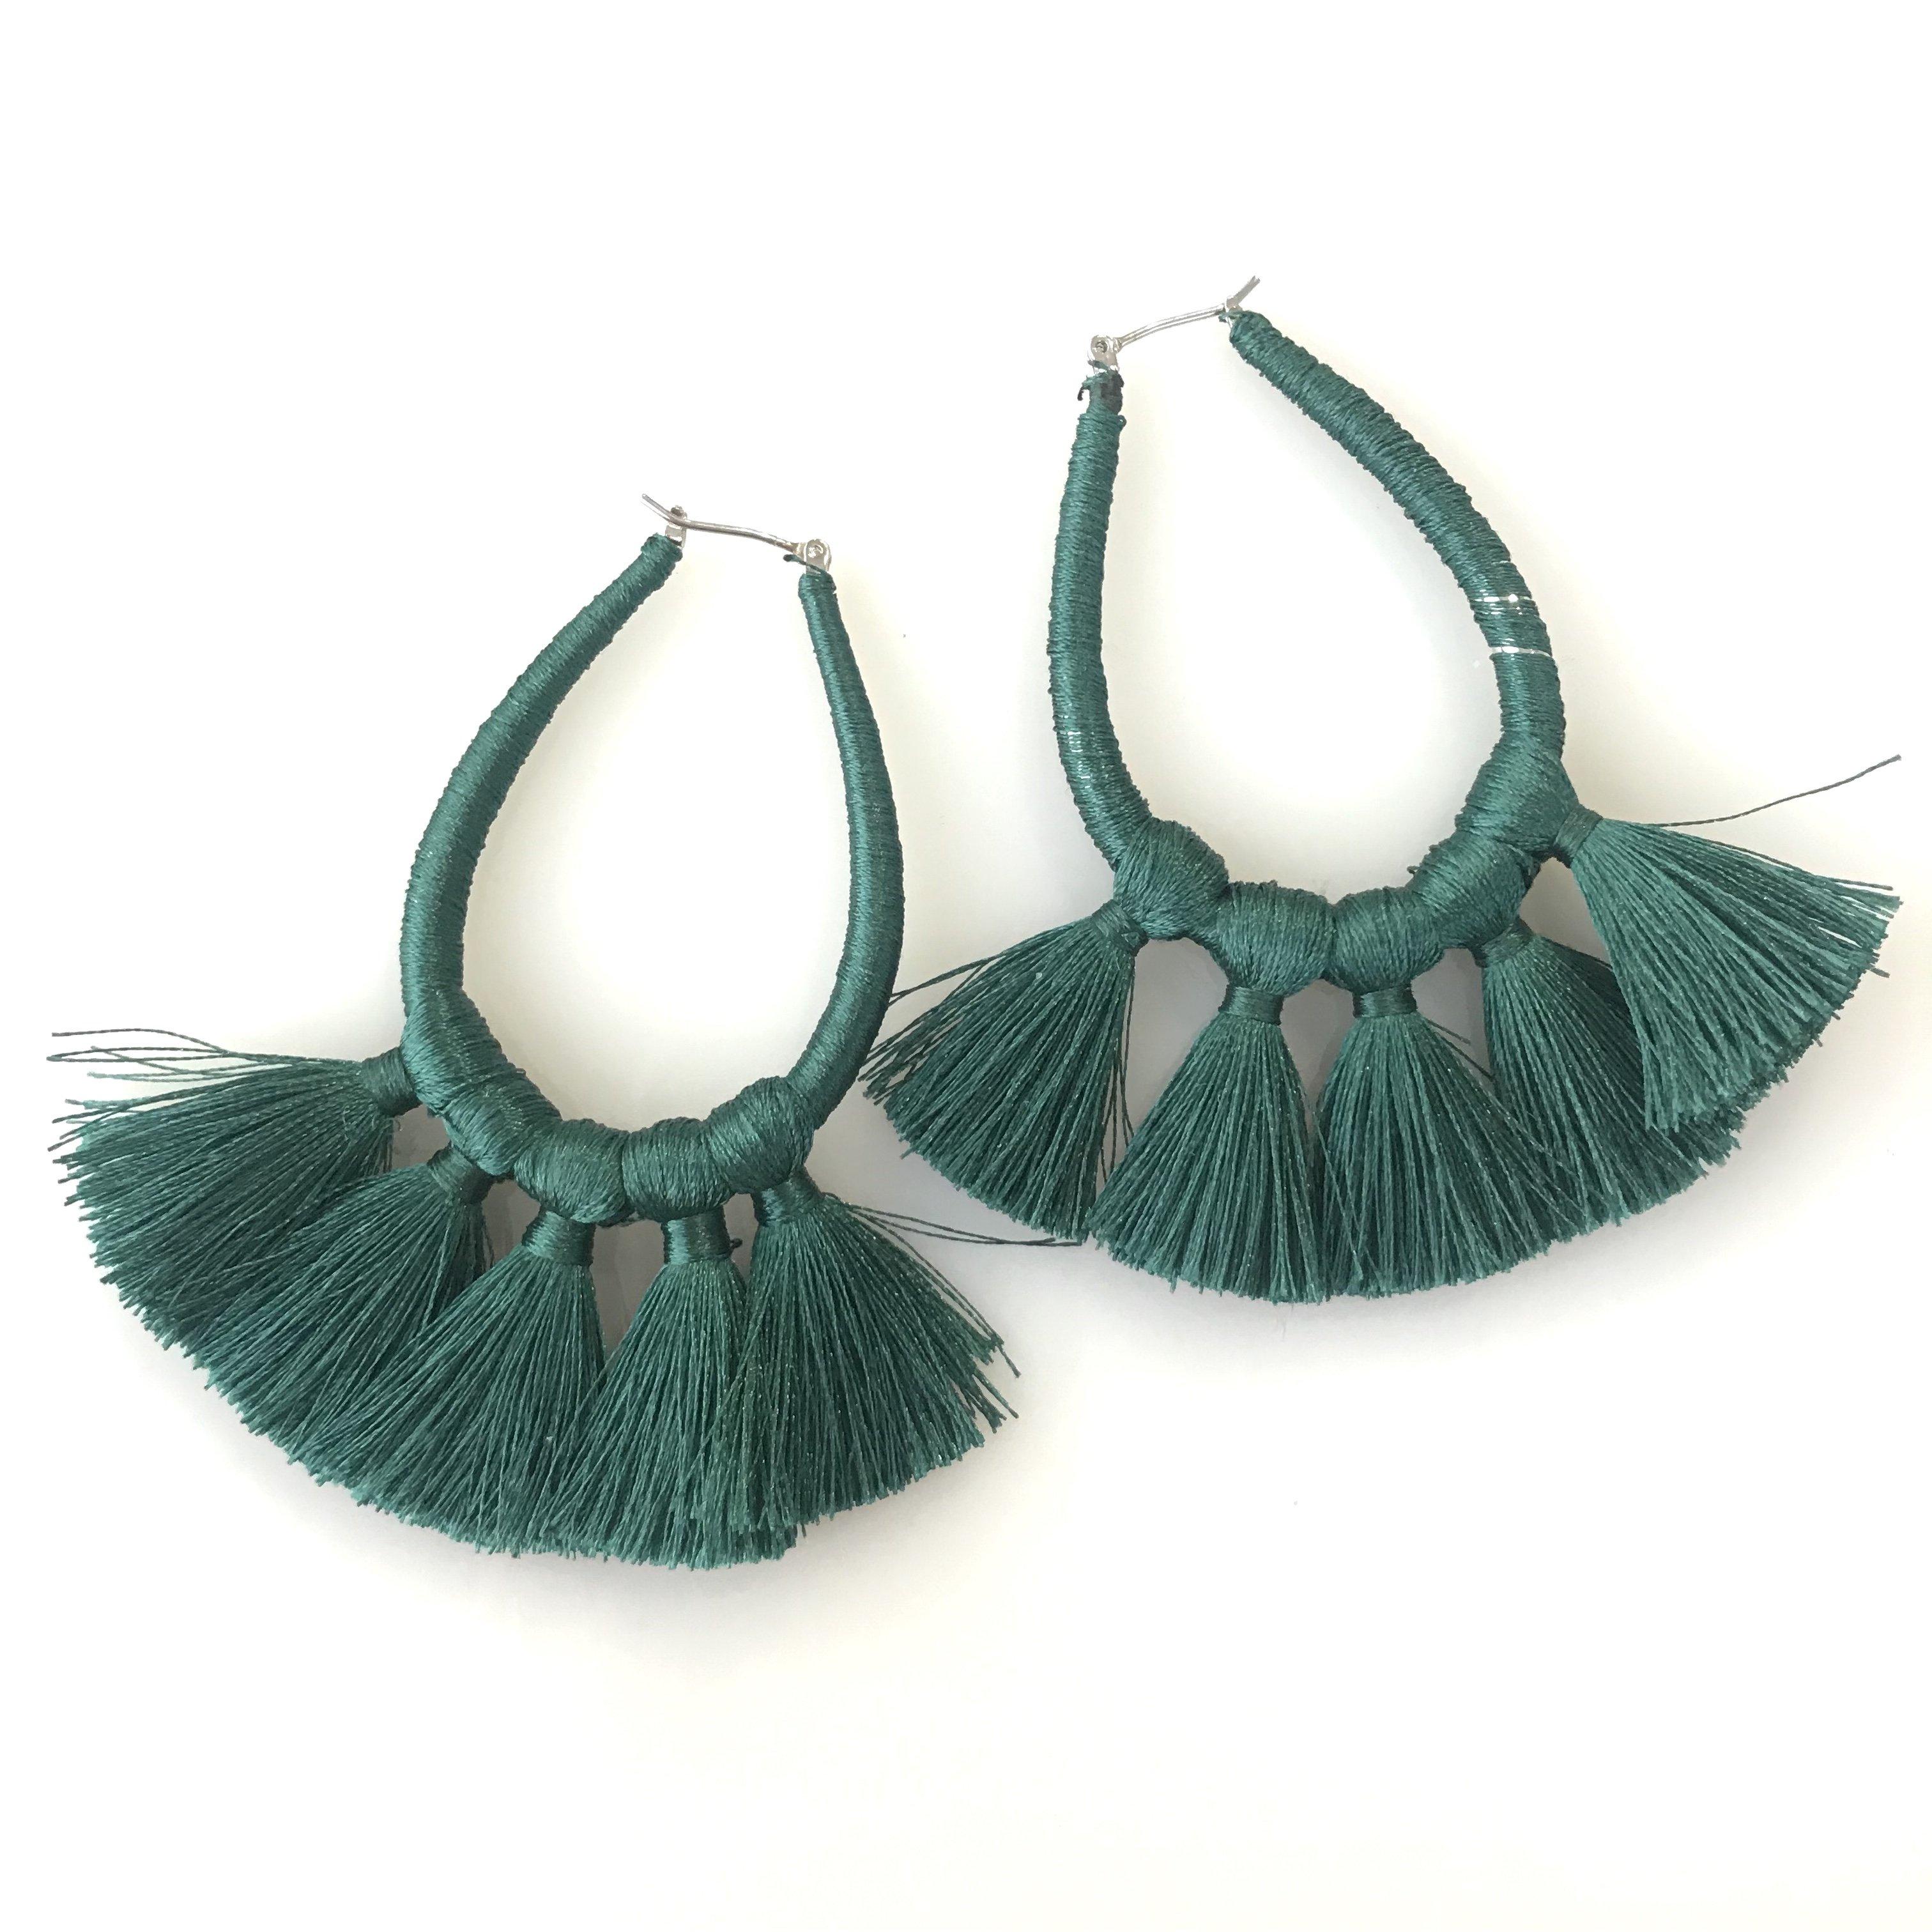 Souks Tassel Earrings